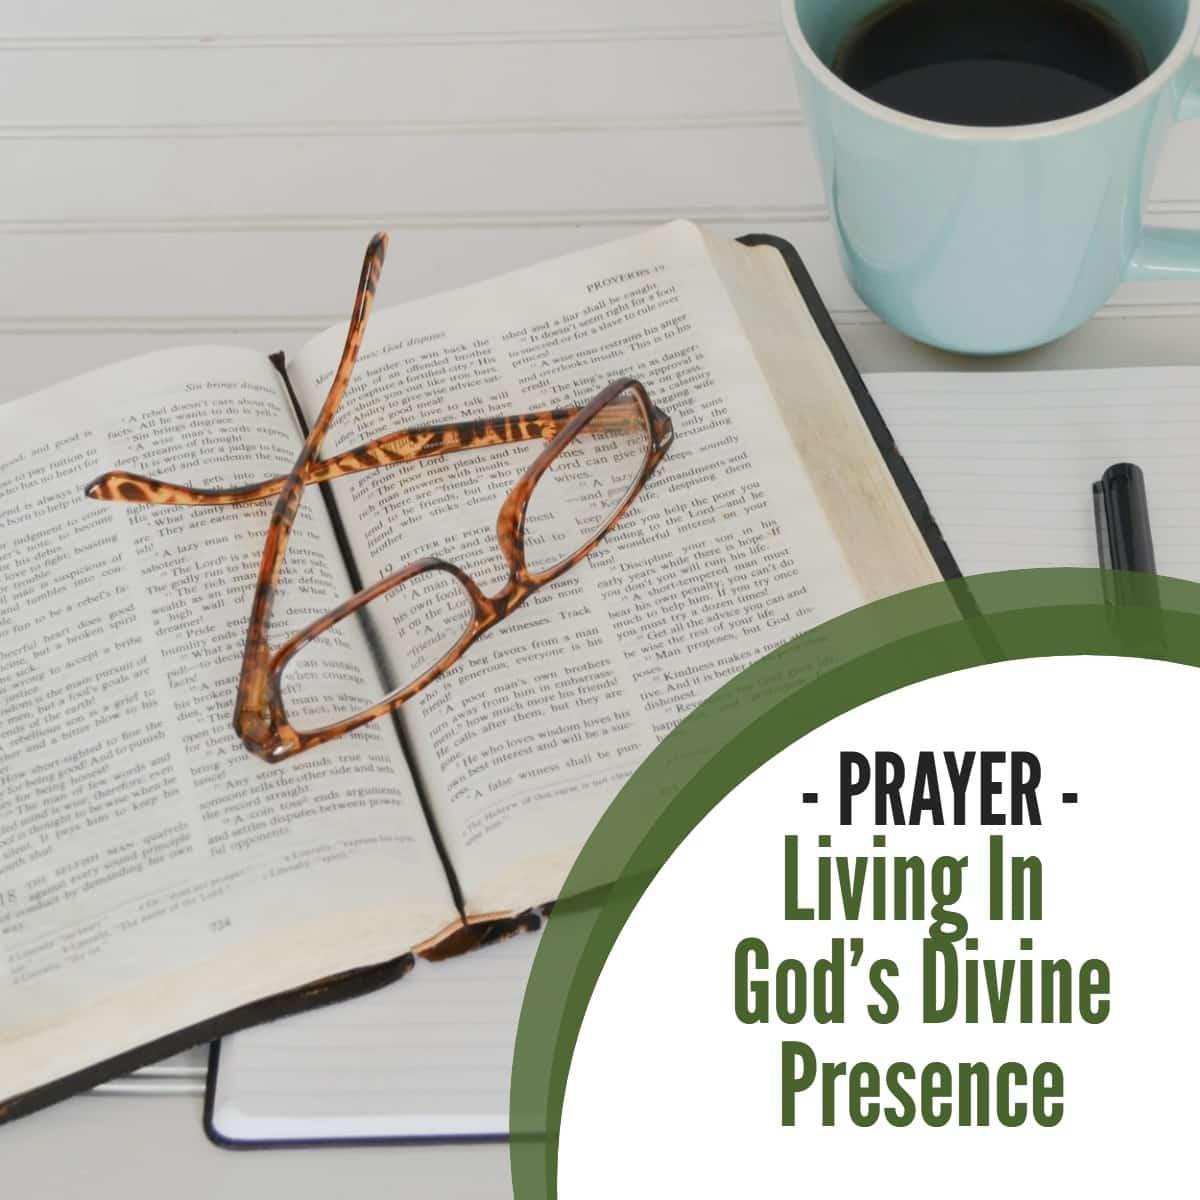 Prayer: Living In God's Divine Presence